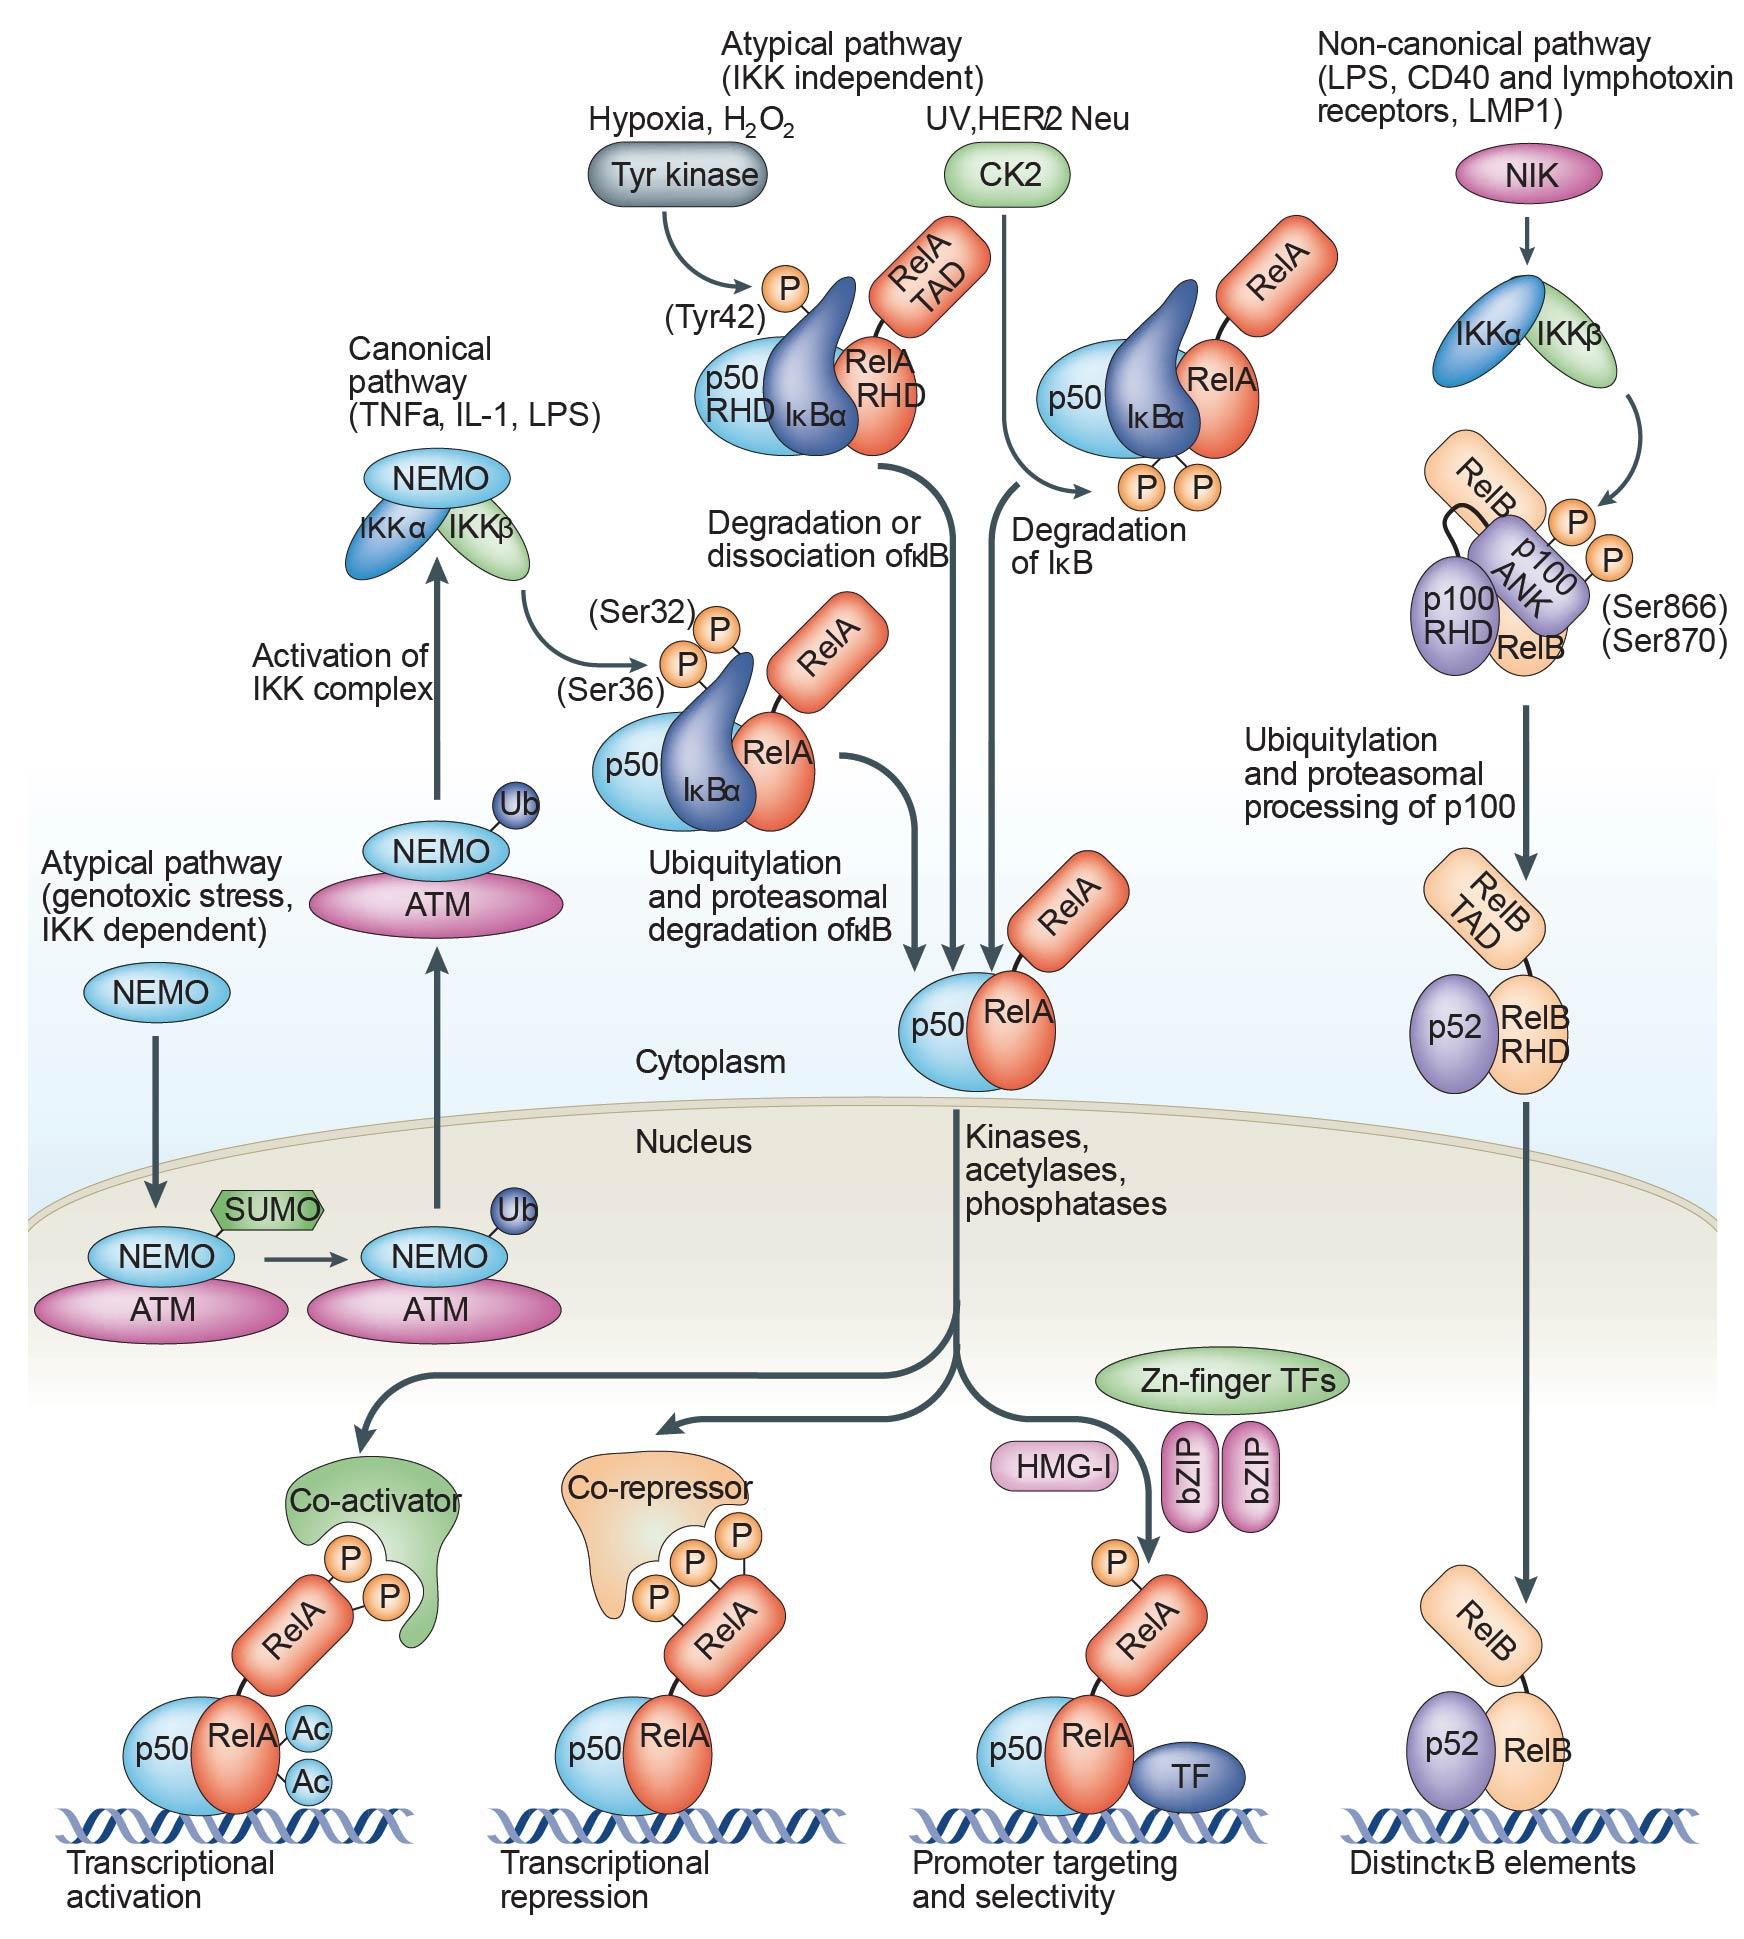 Regulation of NF-kappa B signaling by alternative splicing